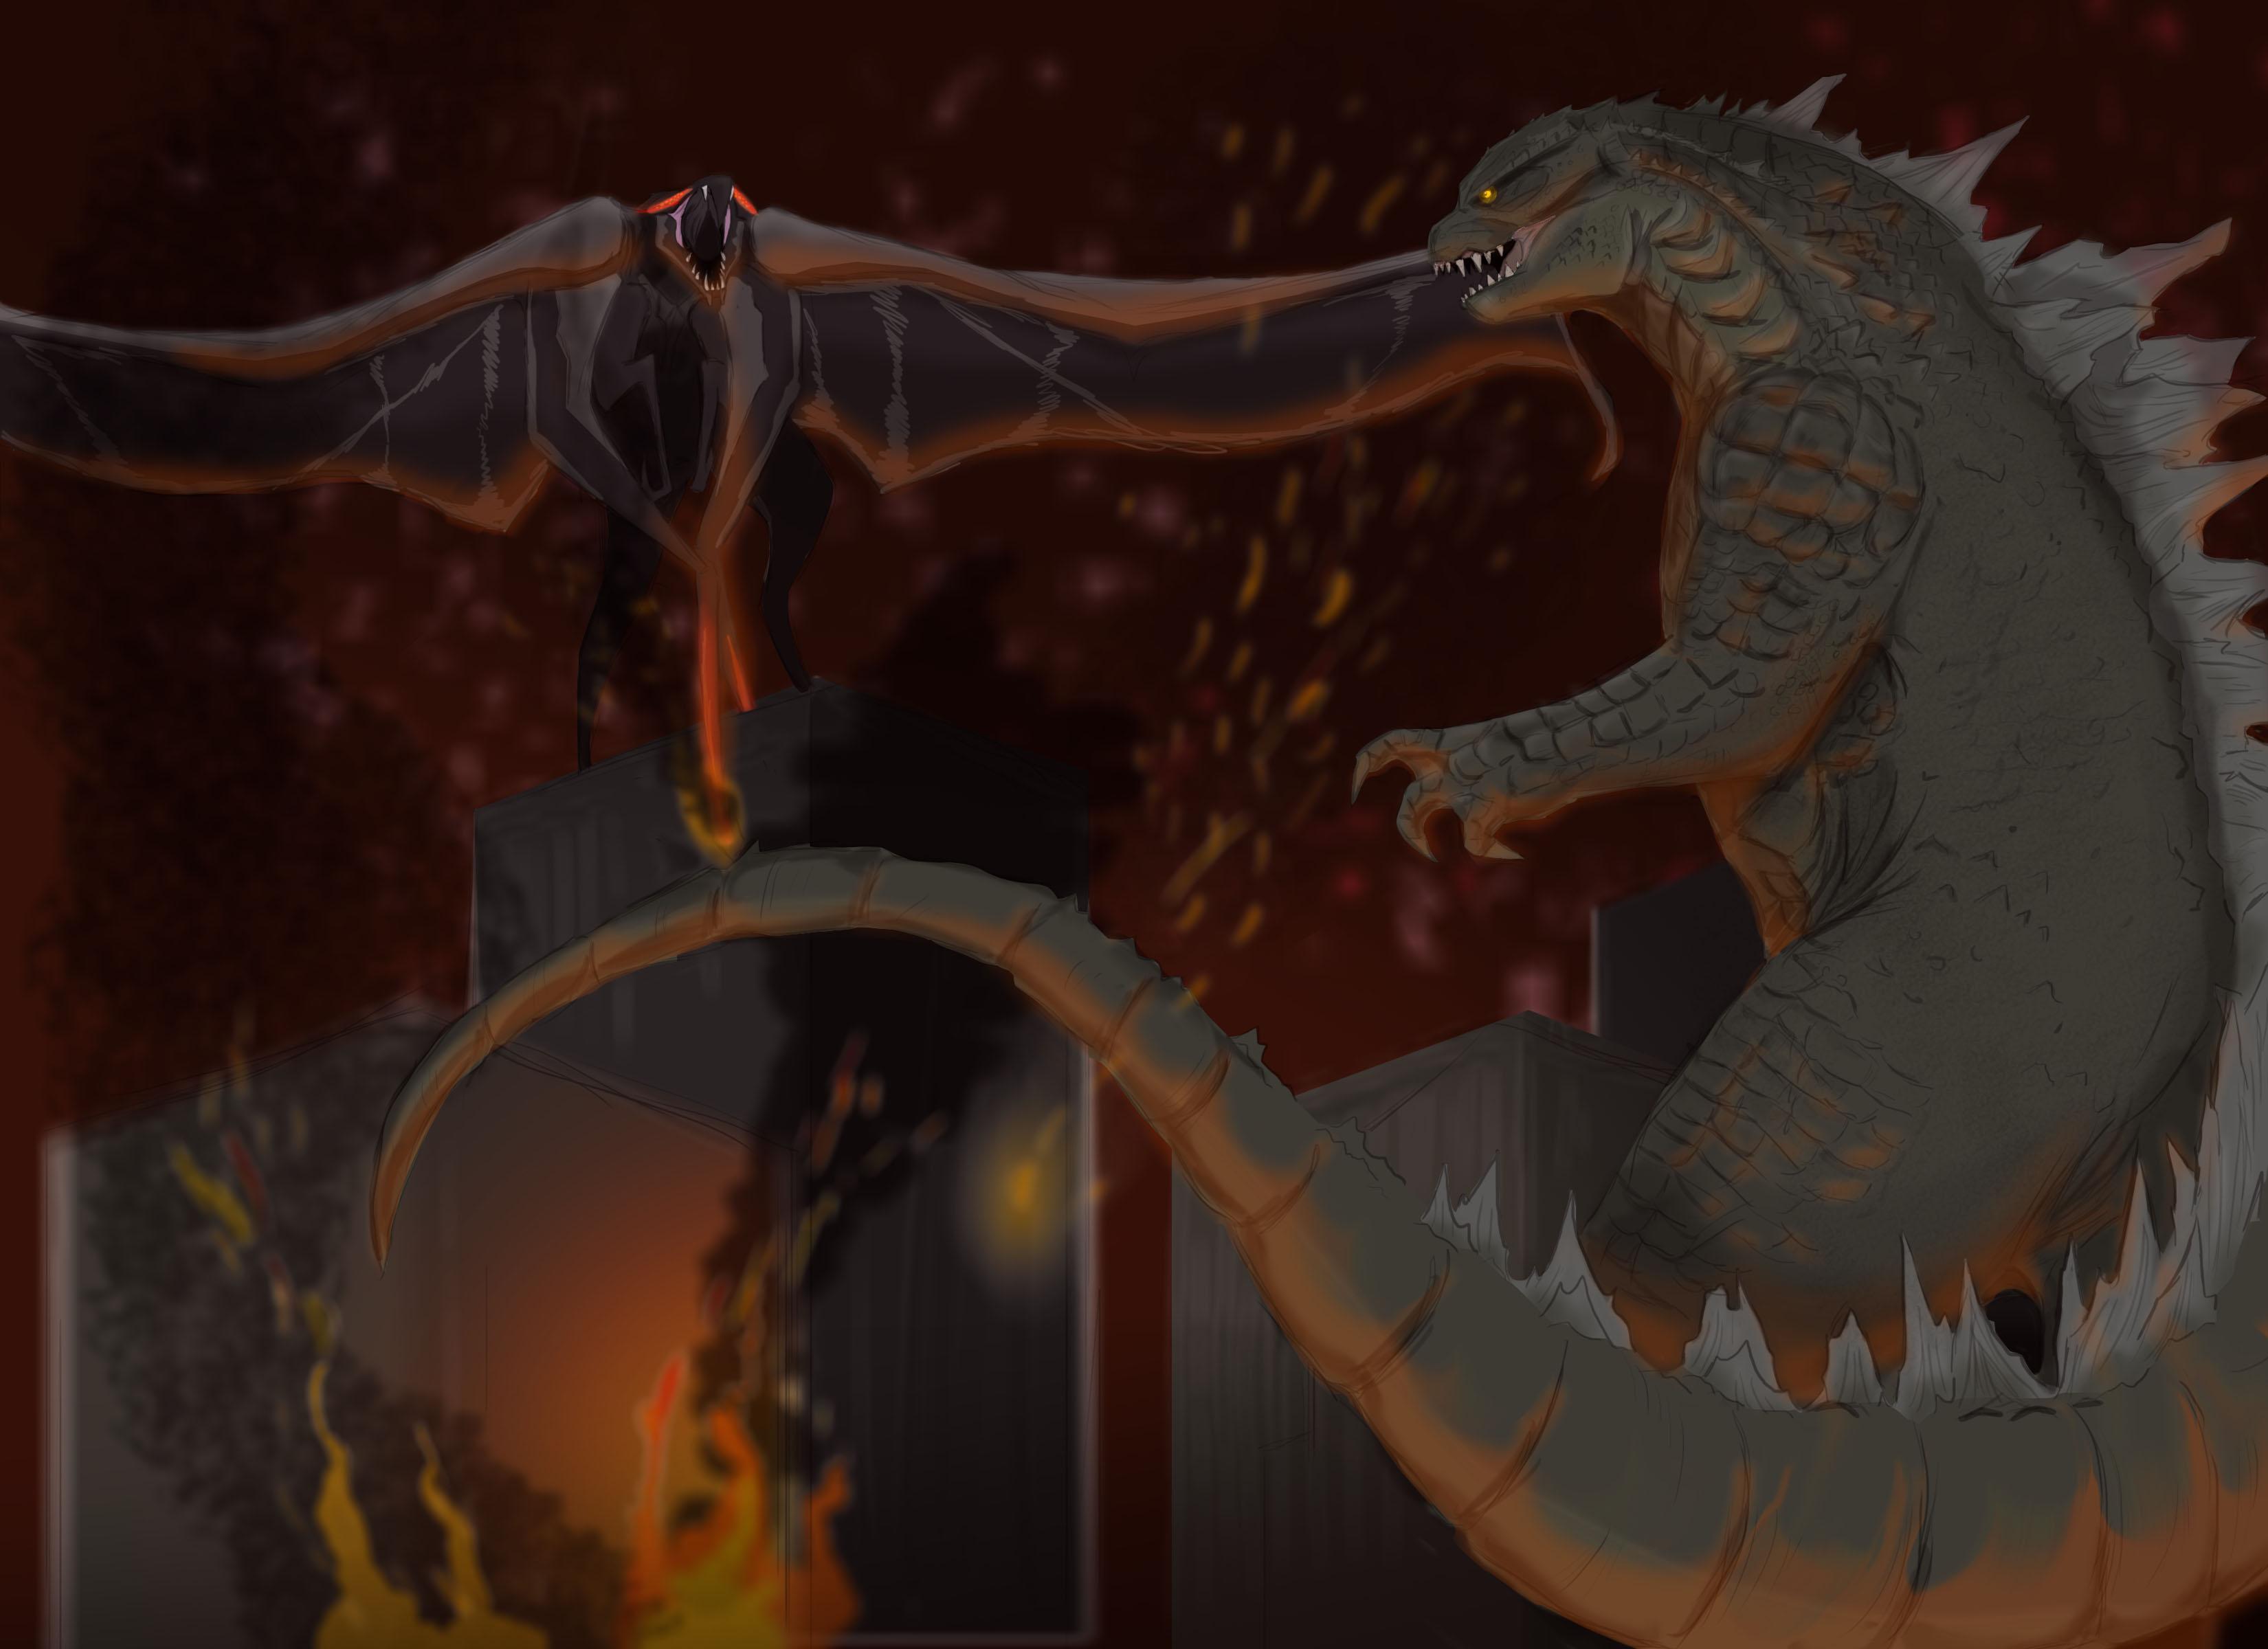 Godzilla vs Muto!